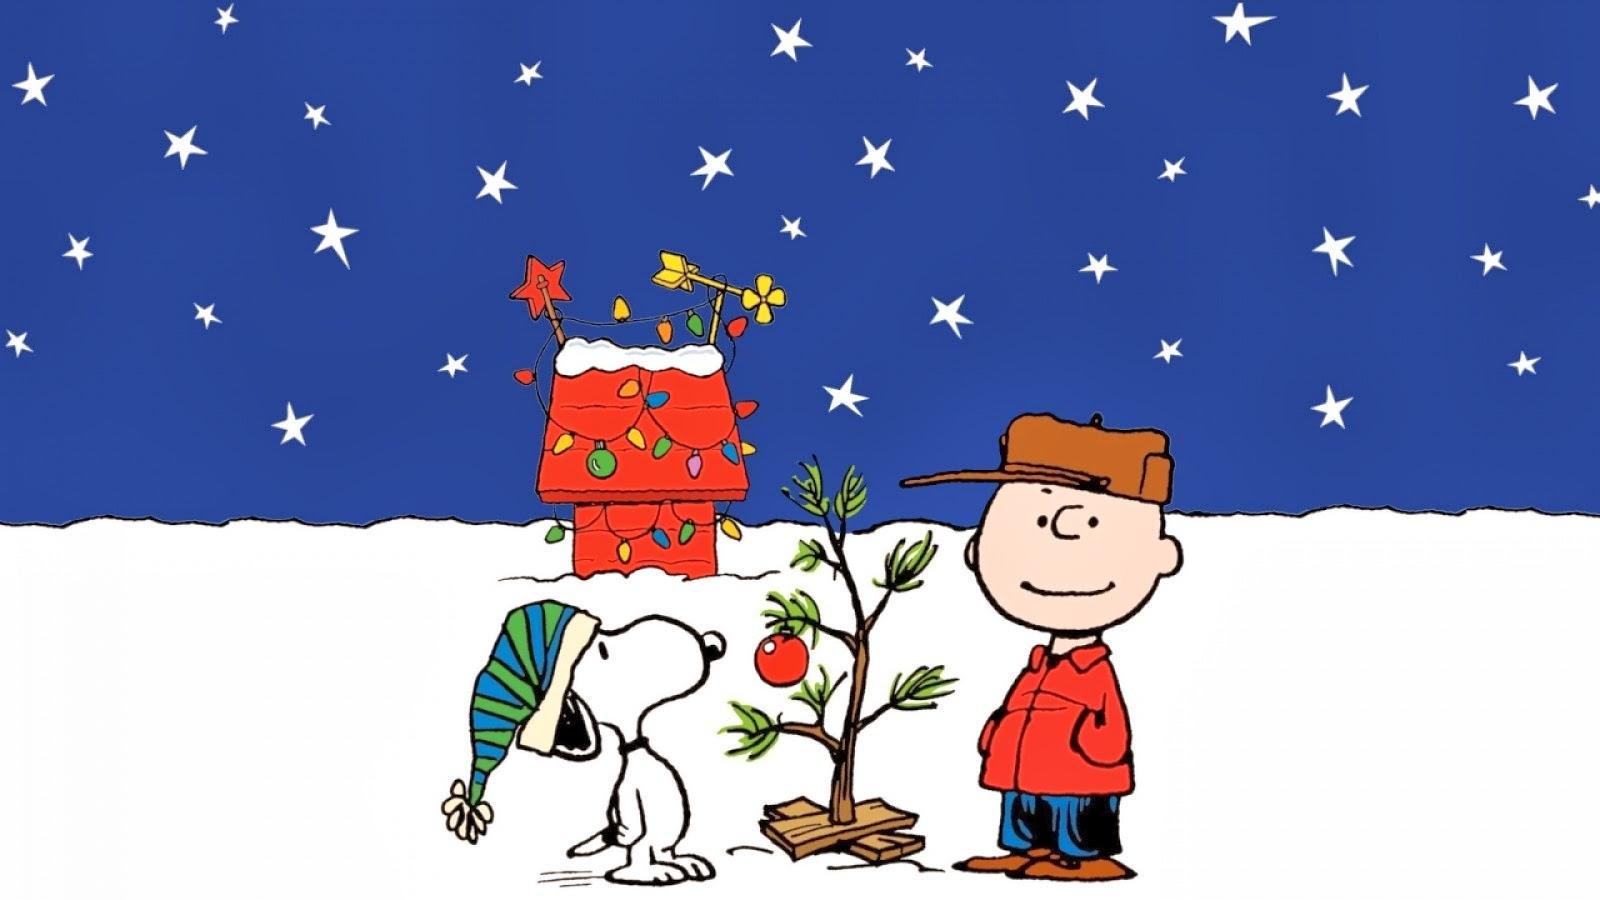 snoopy christmas wallpaper,cartoon,christmas eve,illustration,christmas,flag